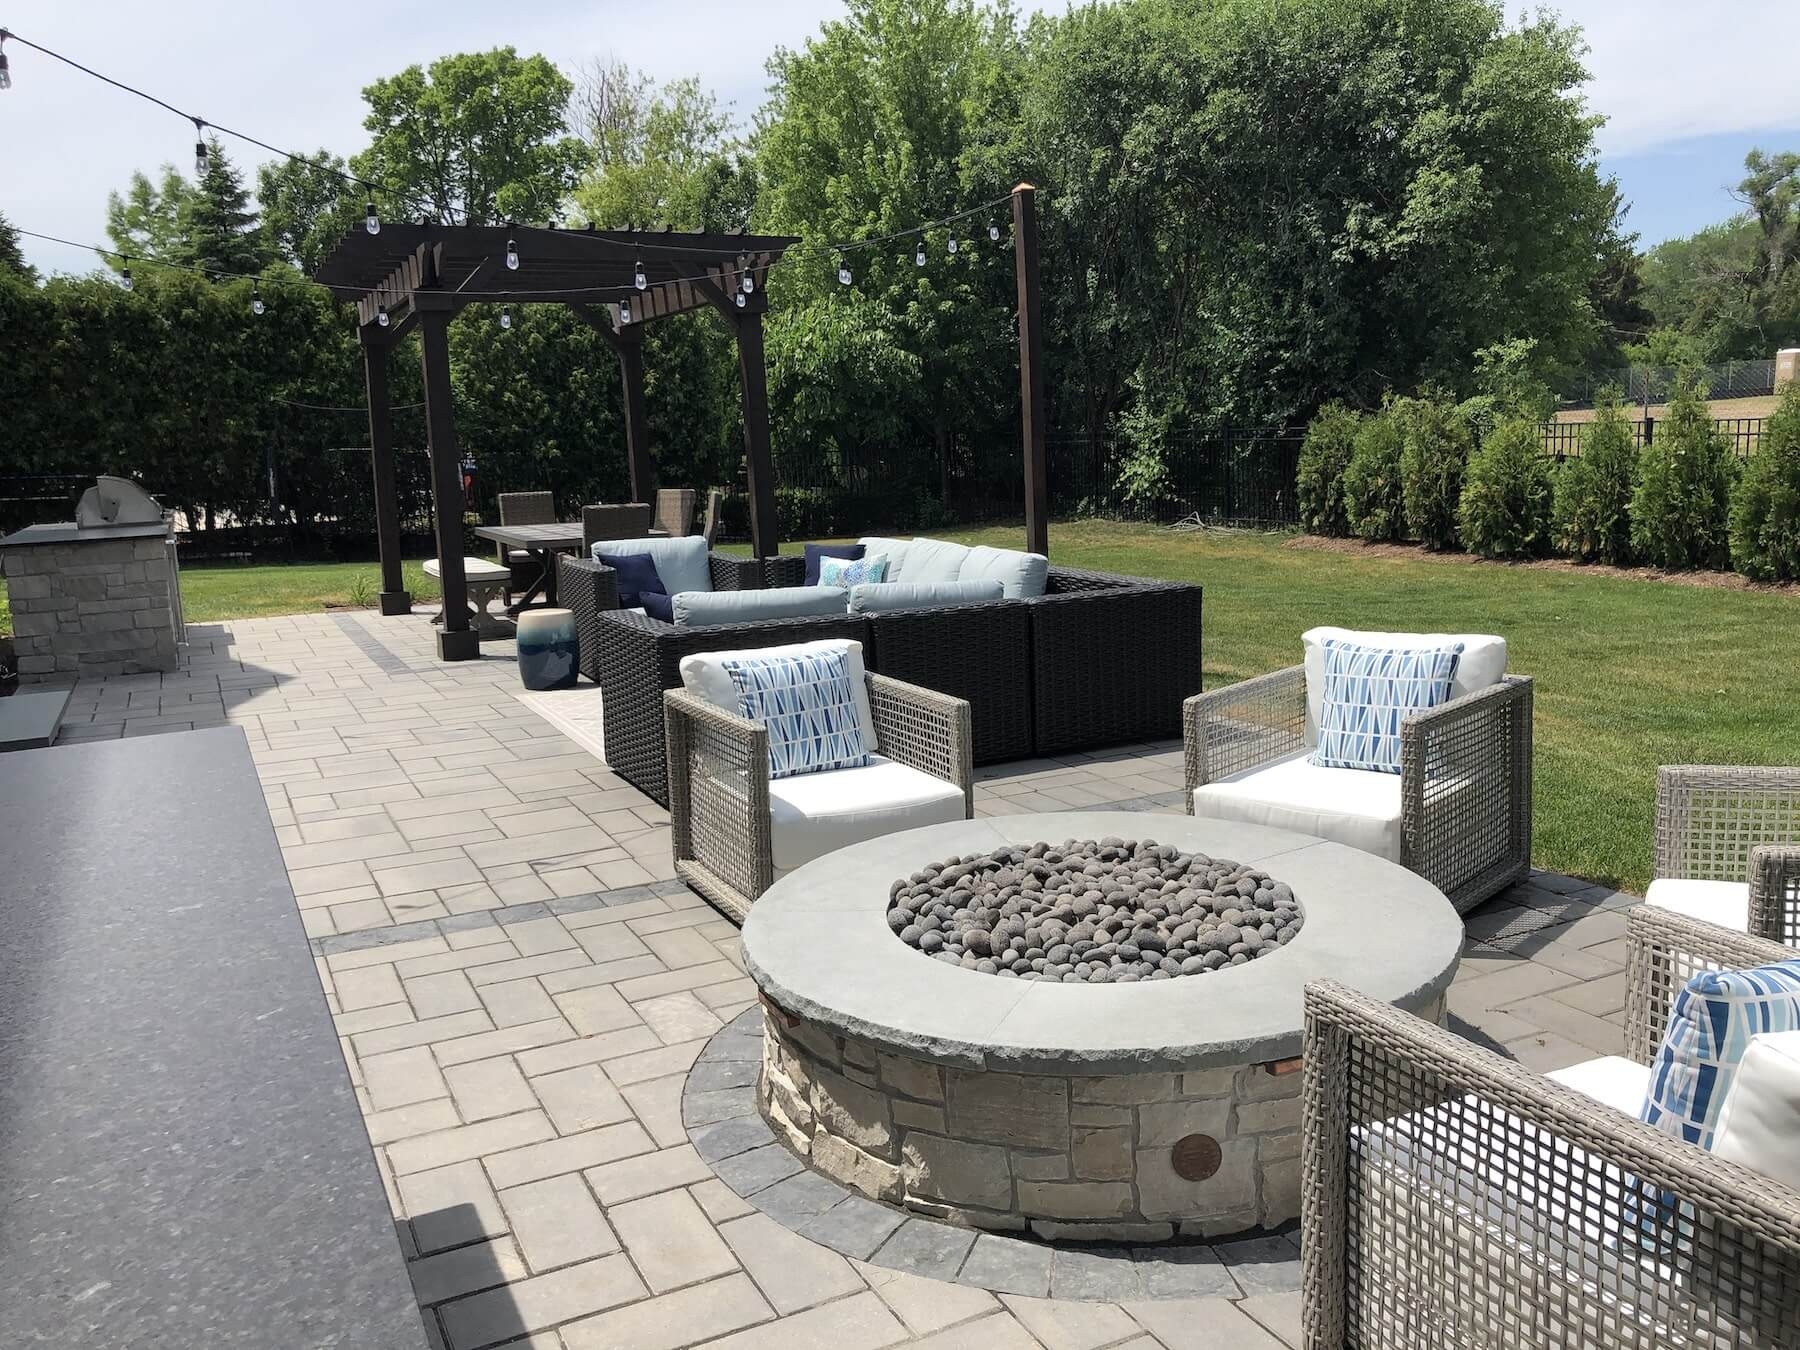 landscape design build paver patio fire pit great oaks landscaping patio furniture outdoor kitchen northbrook il